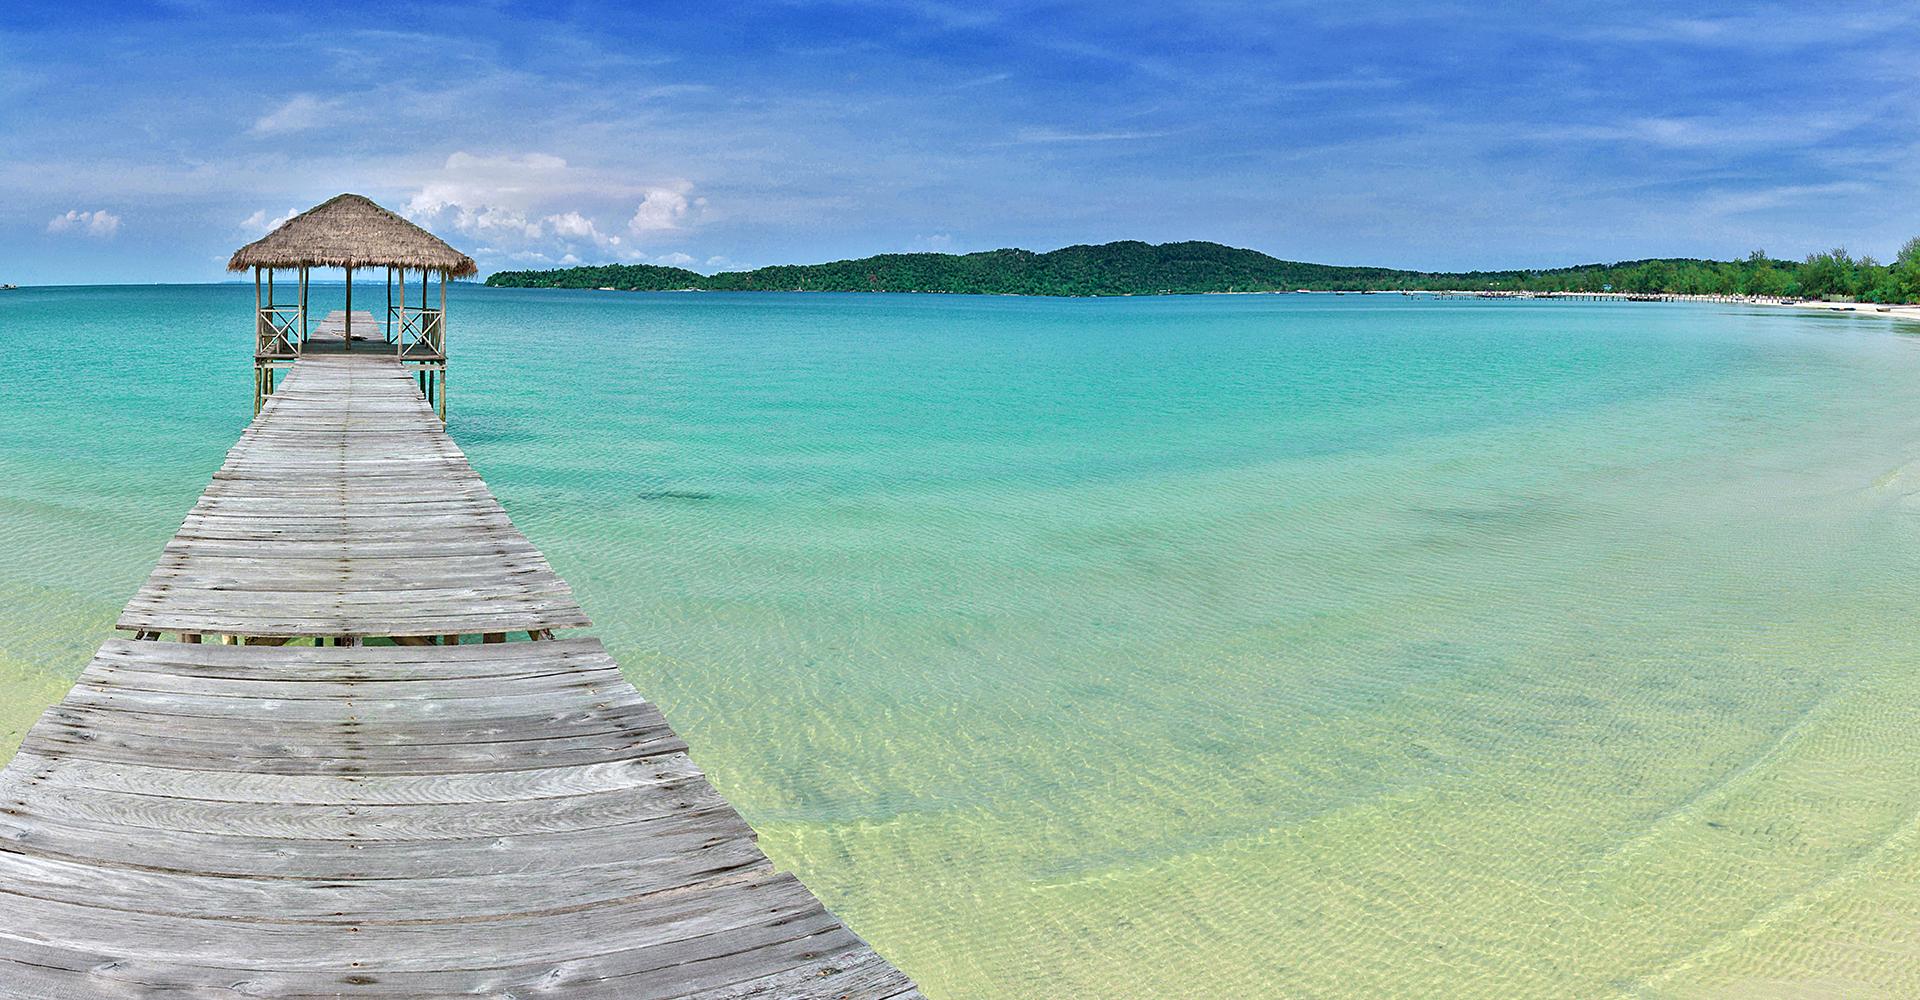 Sihanouville, playa de Camboya